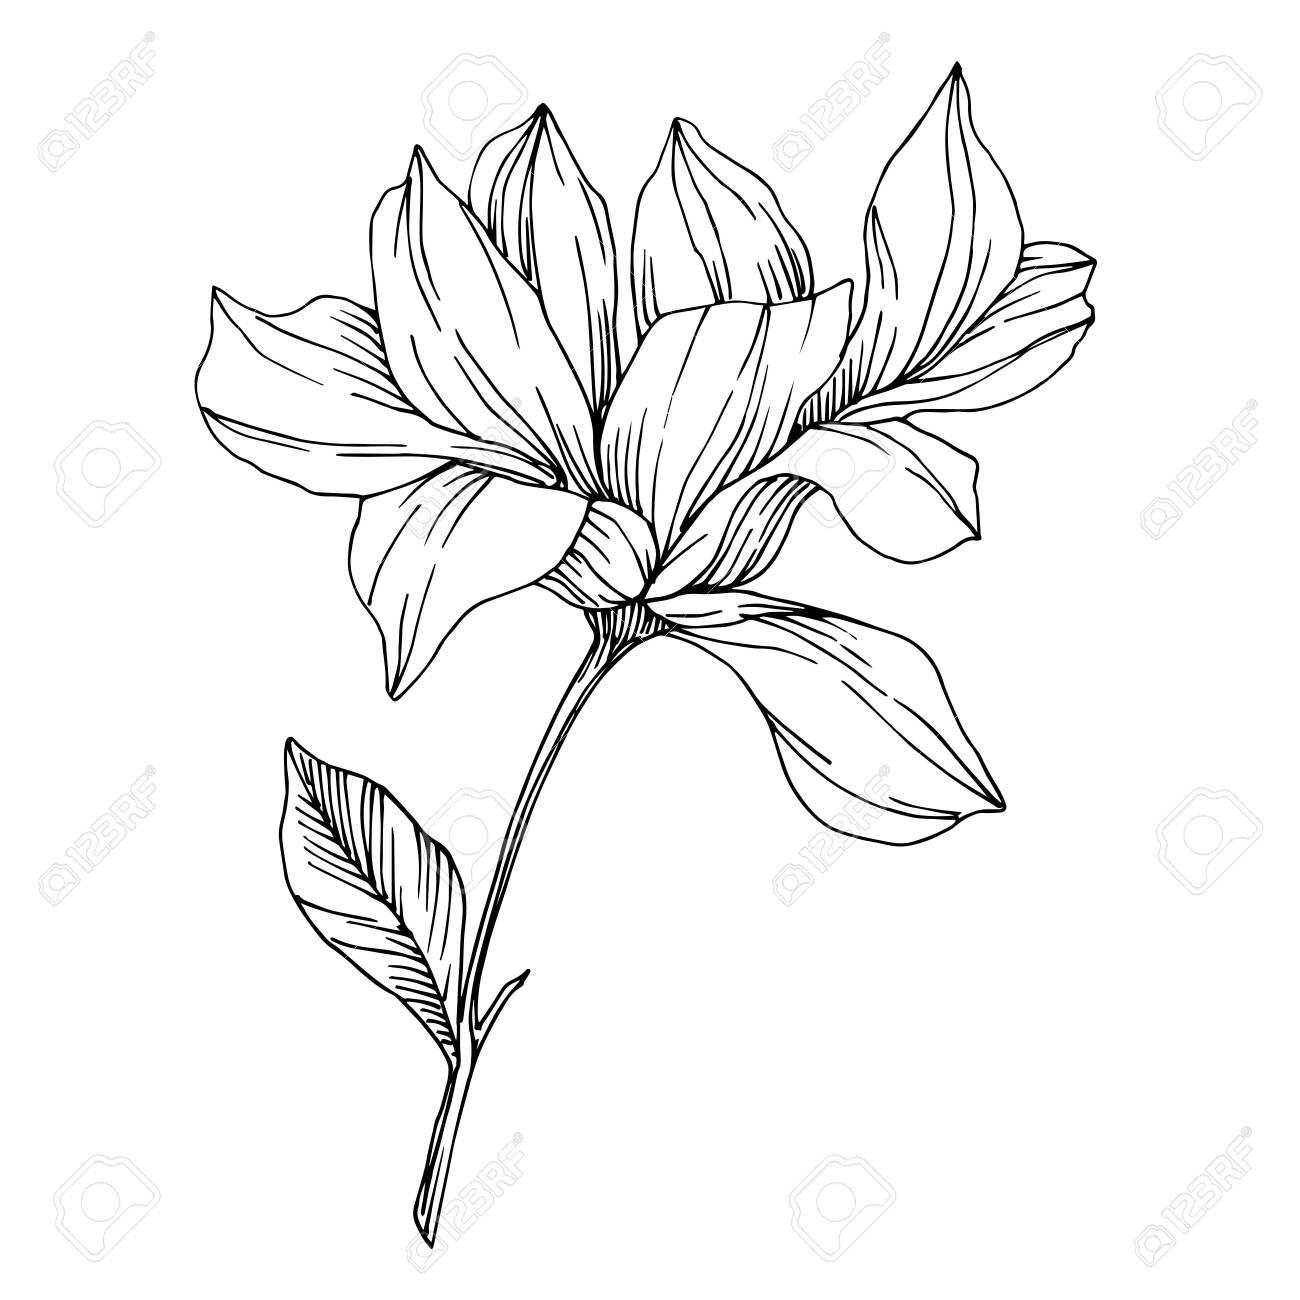 Vector Magnolia floral botanical flowers. Black and white engraved ink art. Isolated magnolia illustration element. - 134233188